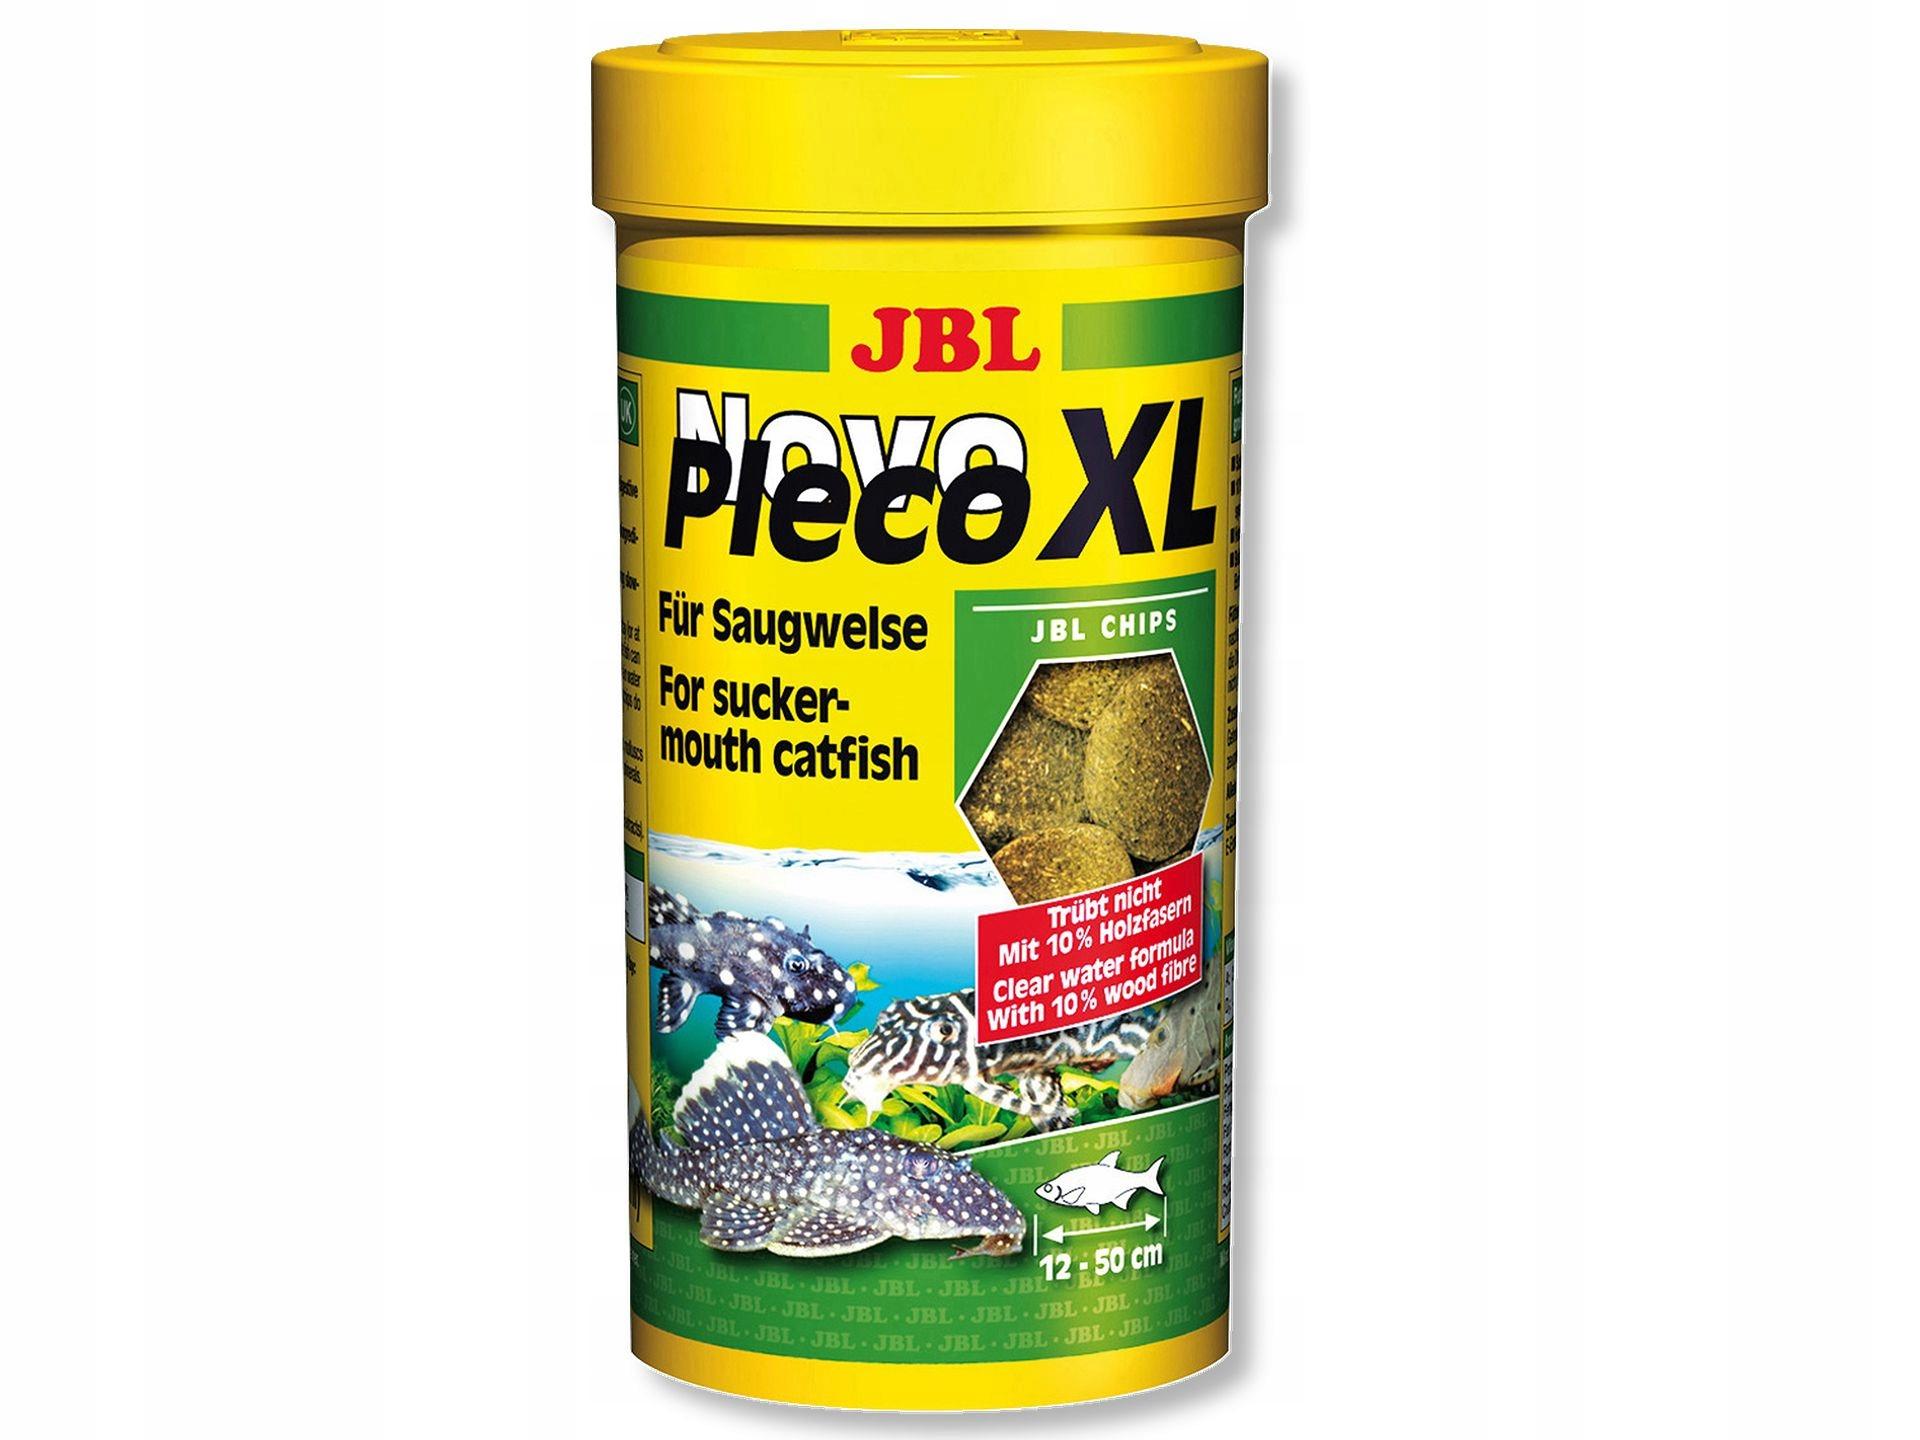 JBL NovoPleco XL 1 liter tablety pre glonojadów